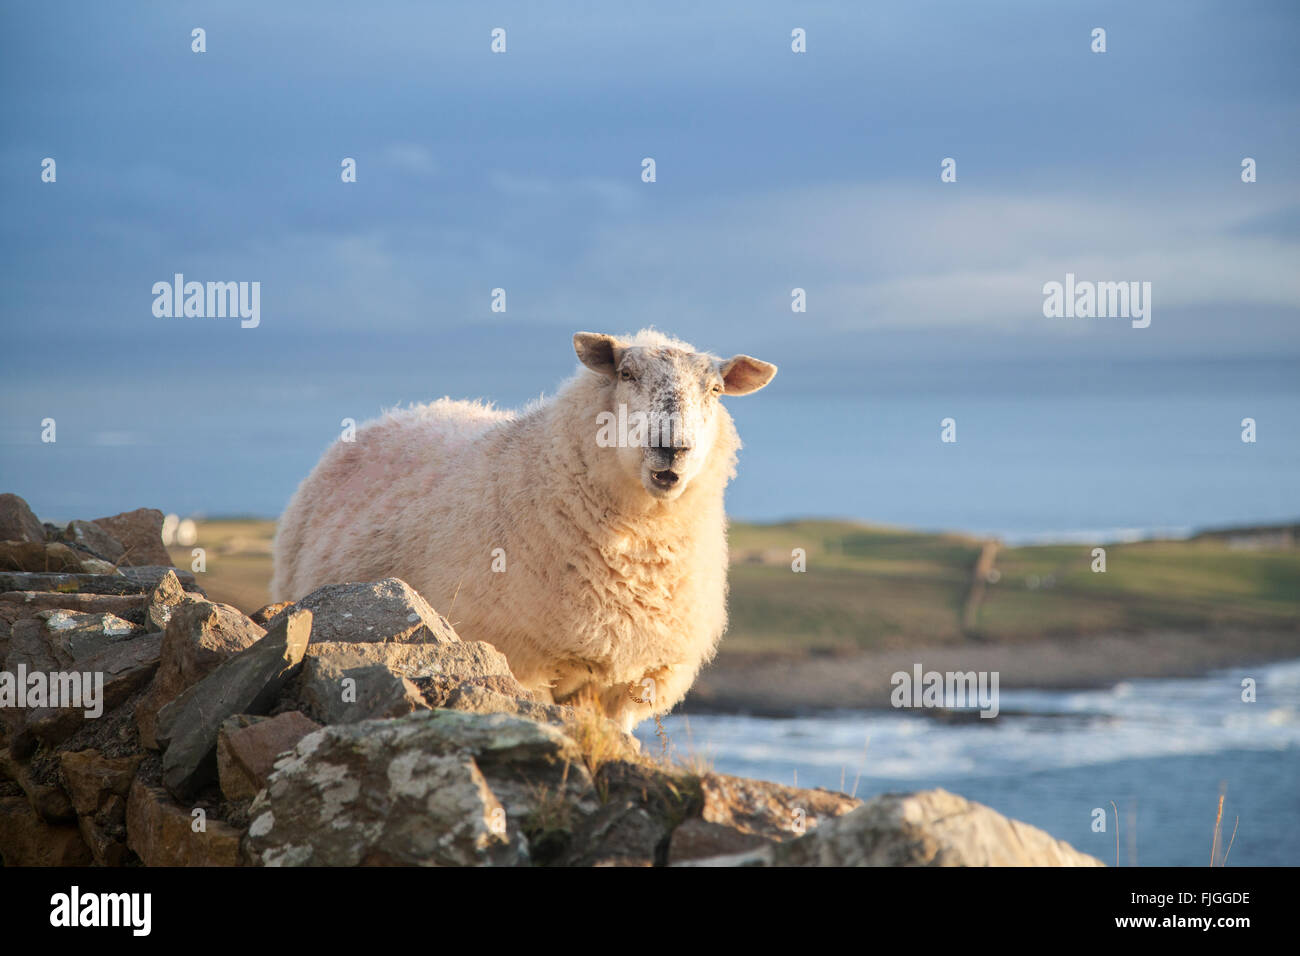 A sheep on the west coast of Ireland - Stock Image